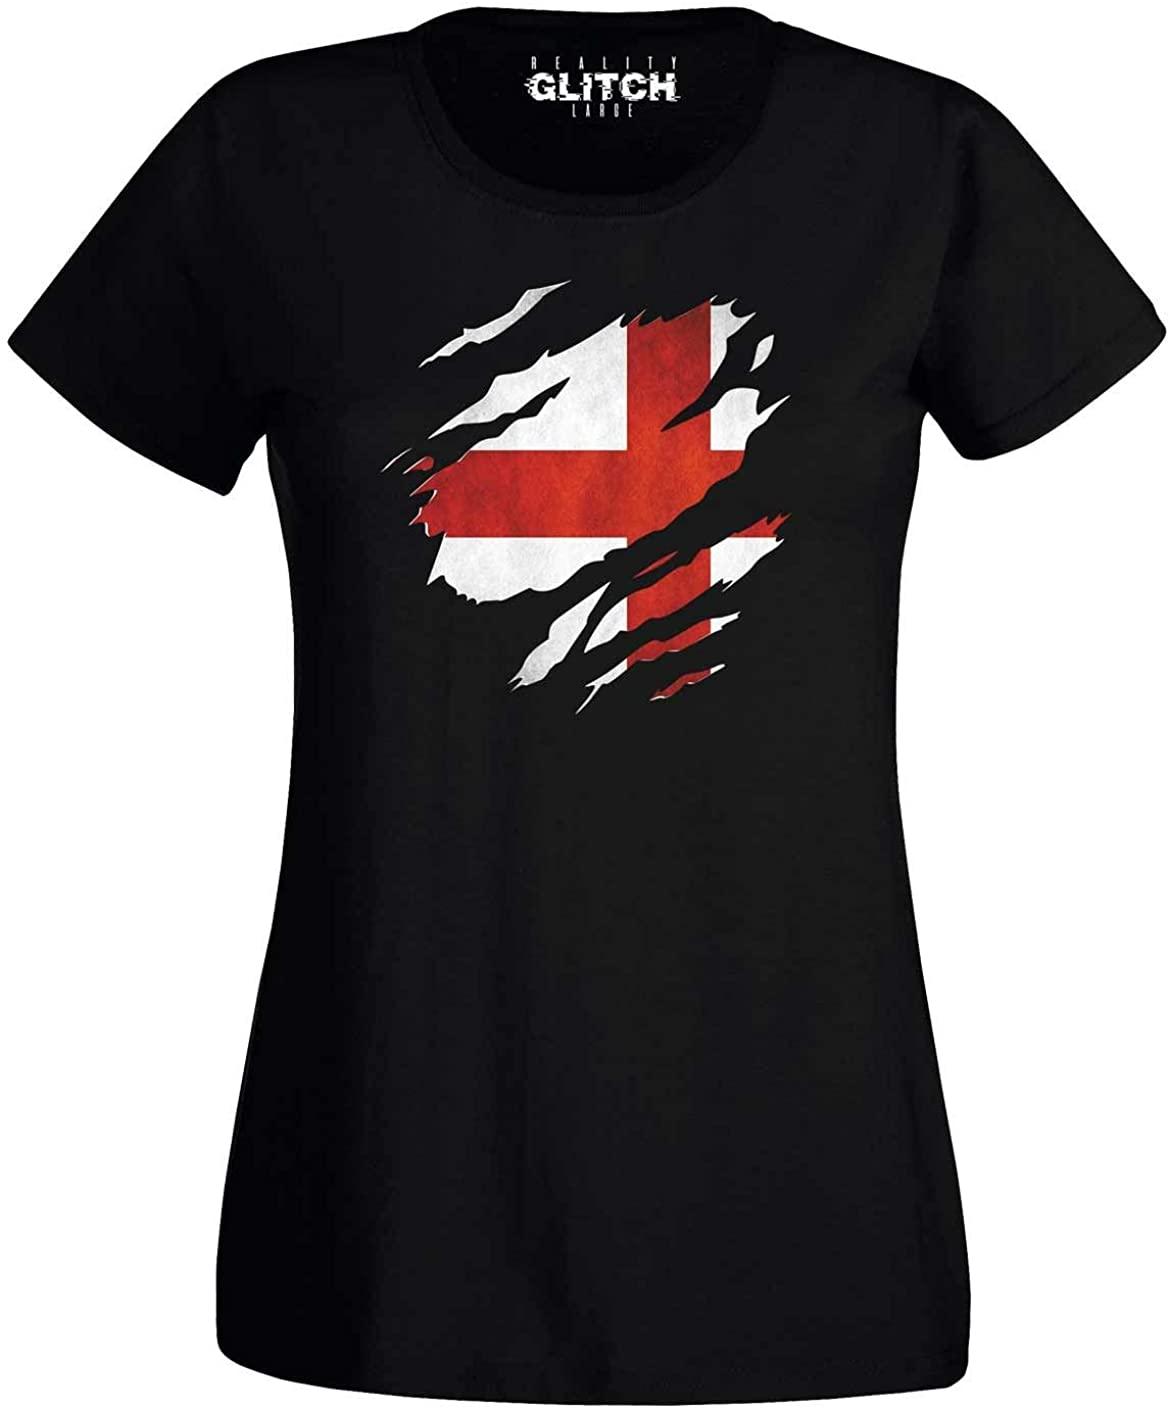 Reality Glitch Women's Torn England T-Shirt